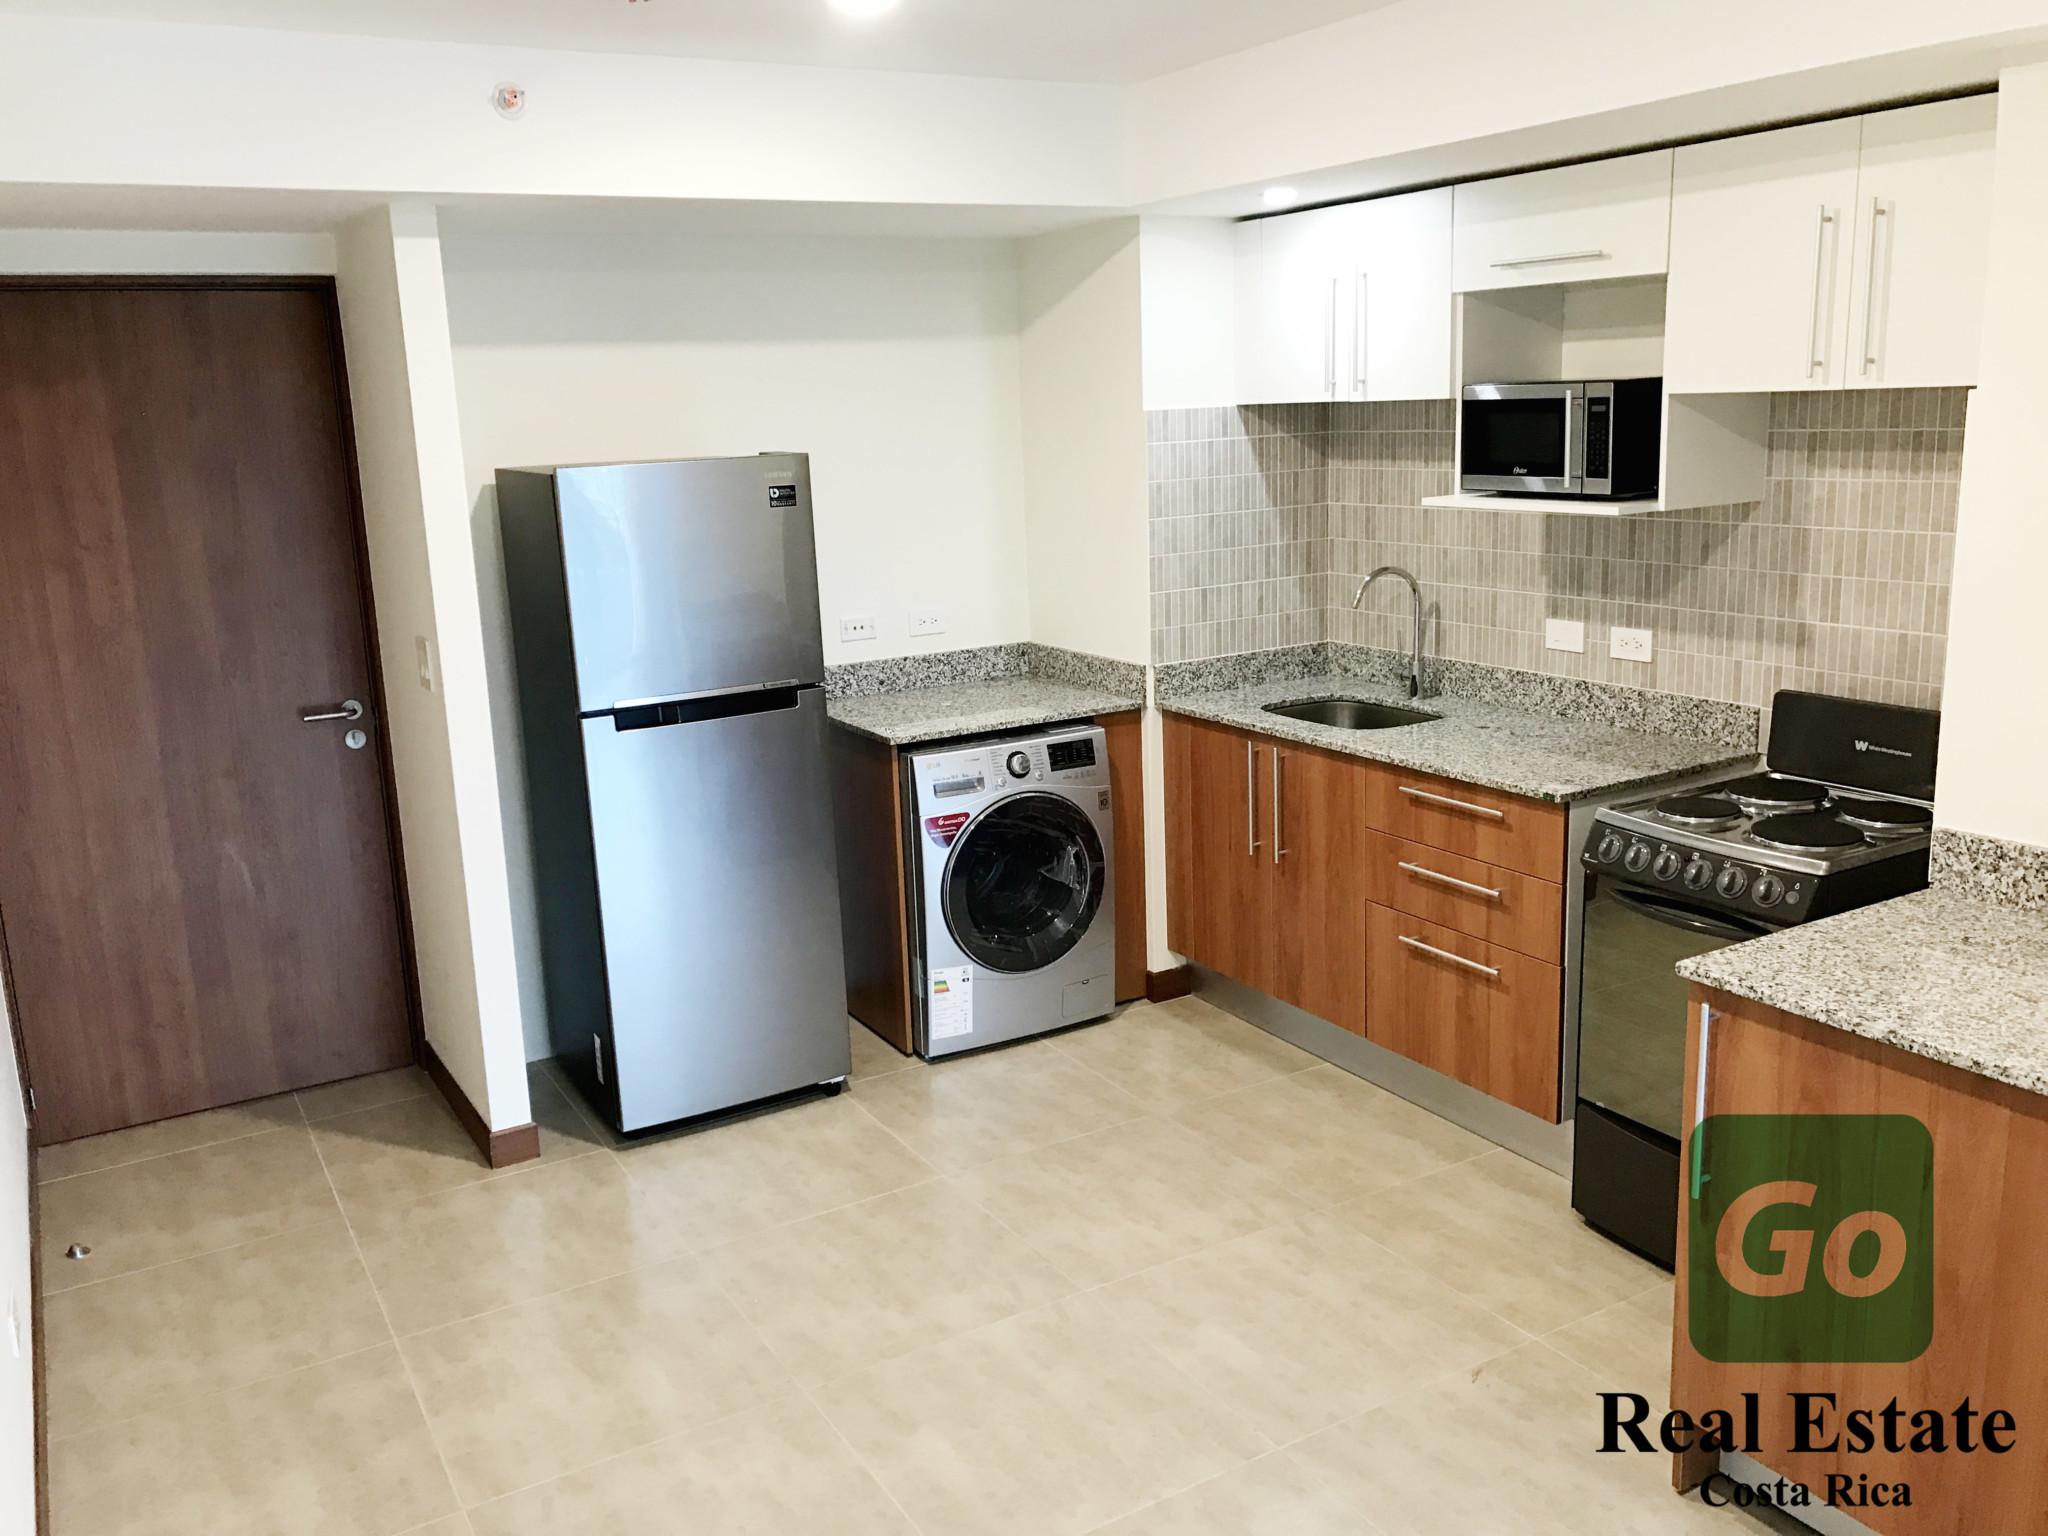 Apartamento, Latitud Los Yoses, San Pedro de Montes de Oca